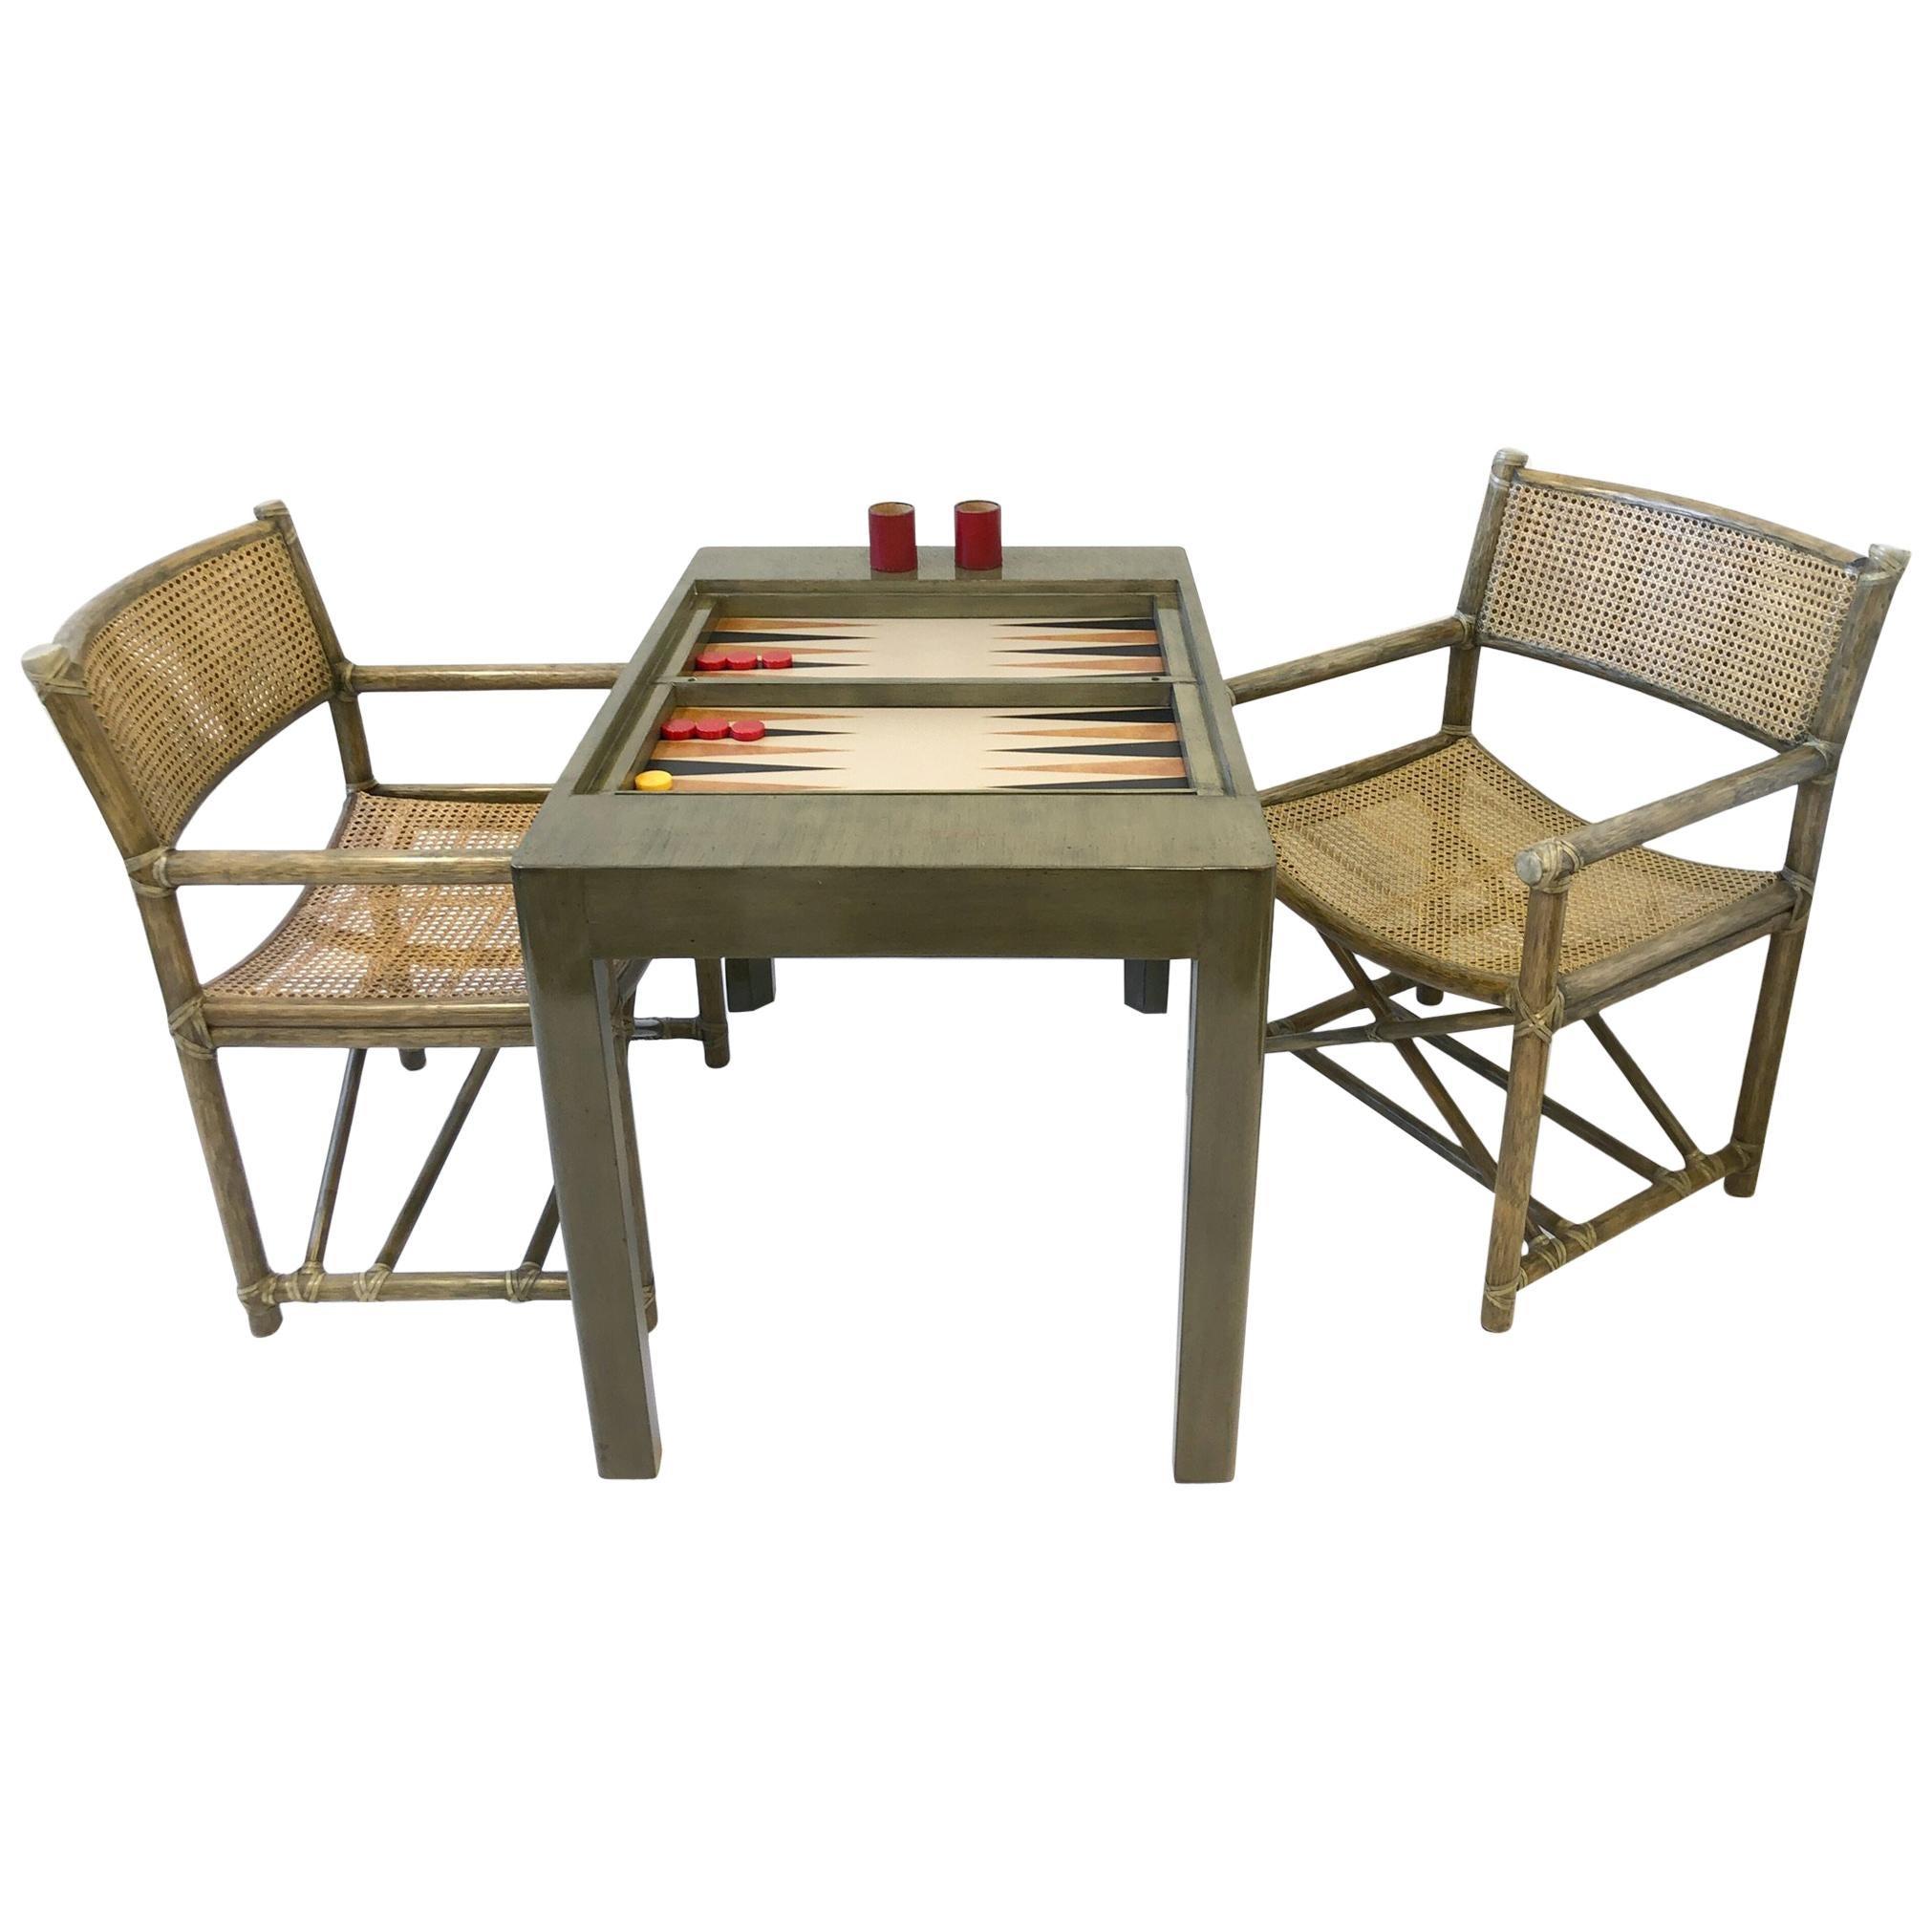 Bob Hopes Backgammon Game Table Set By Steve Chase